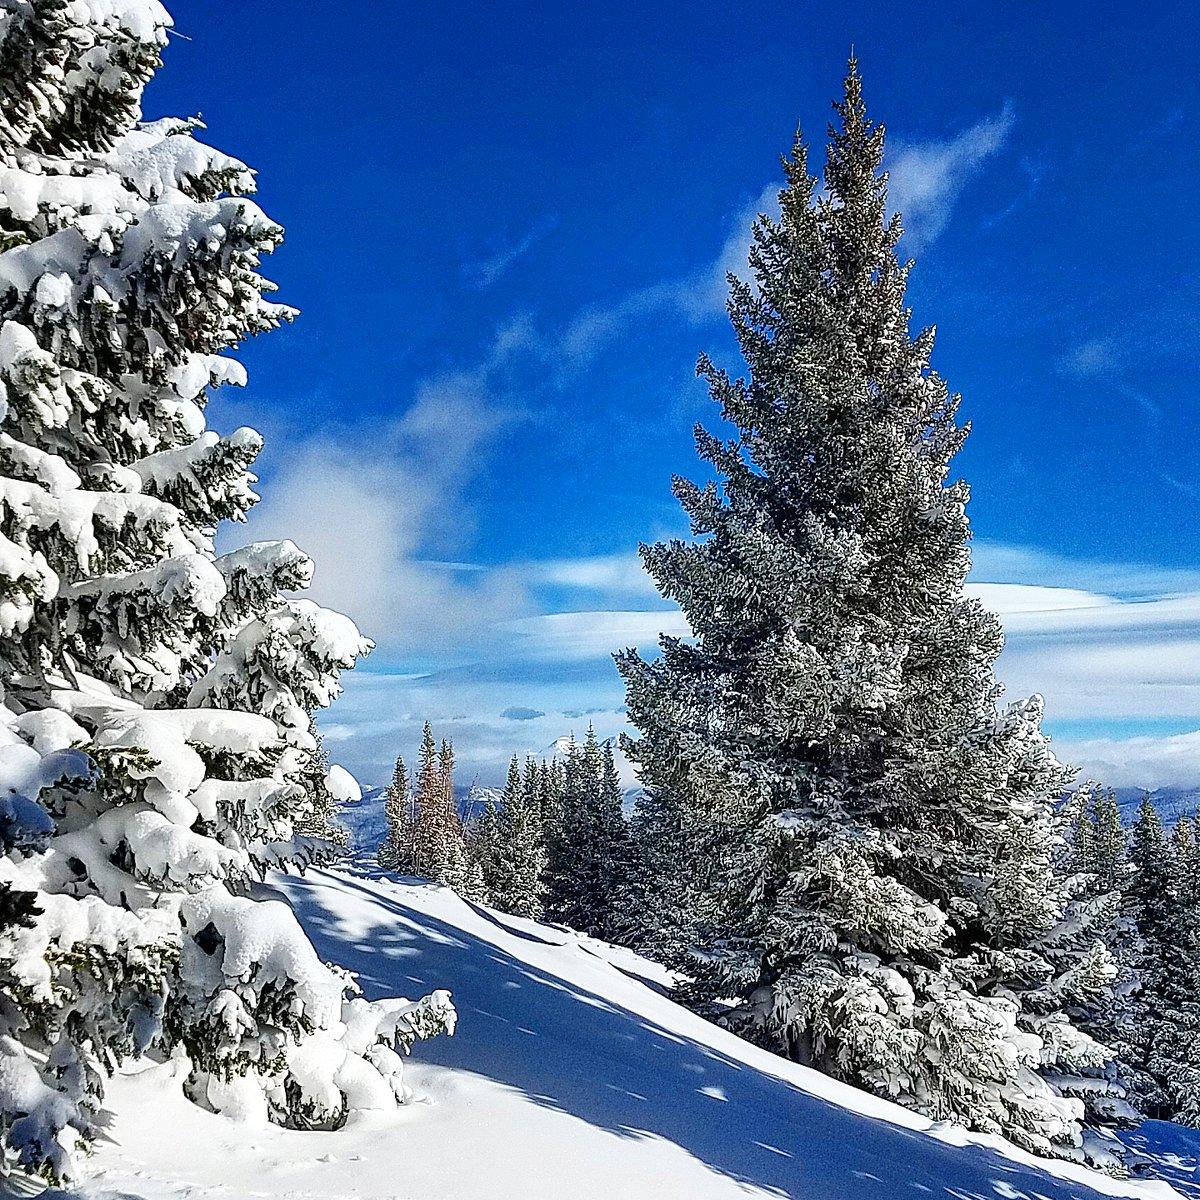 #TGIF Stash hunting @breckenridgemtn #ski & #snowboard nation! #ApresLIVE #Breckenridge #Colorado #Wanderlust #Breck #Travel #TravelLife #TravelGuide #photography #TravelPhotos #TravelPhotography #LuxuryTravel #skiing #snowboarding #Mountains #MountainPhotos #MountainPhotography